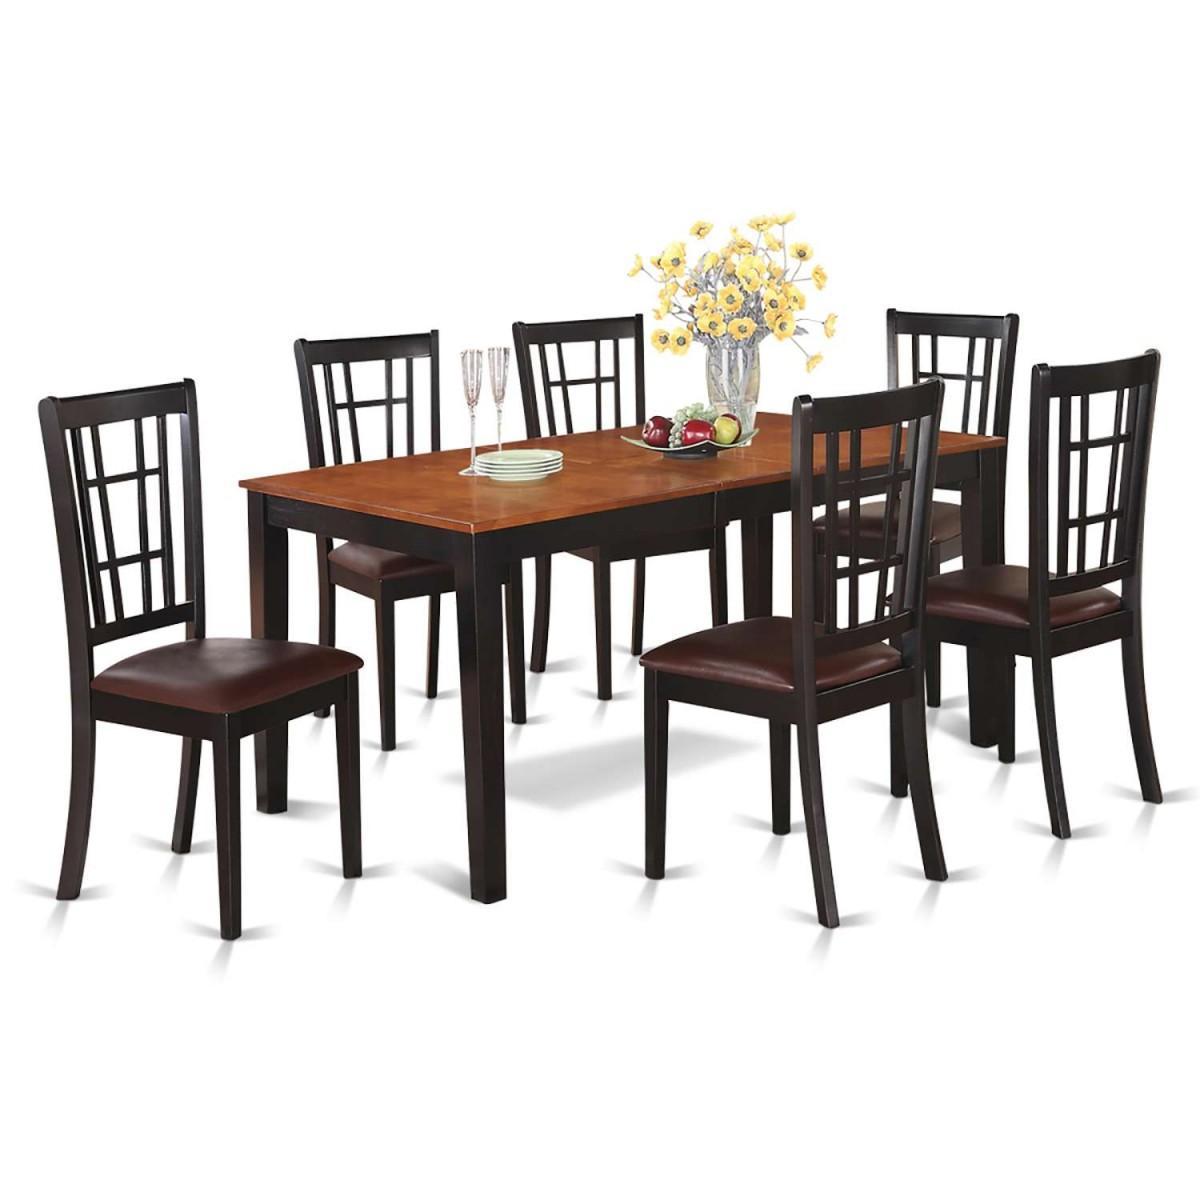 East West Nicoli 6 Piece Dining Set: East West Furniture Nicoli 7 Piece Dining Room Set